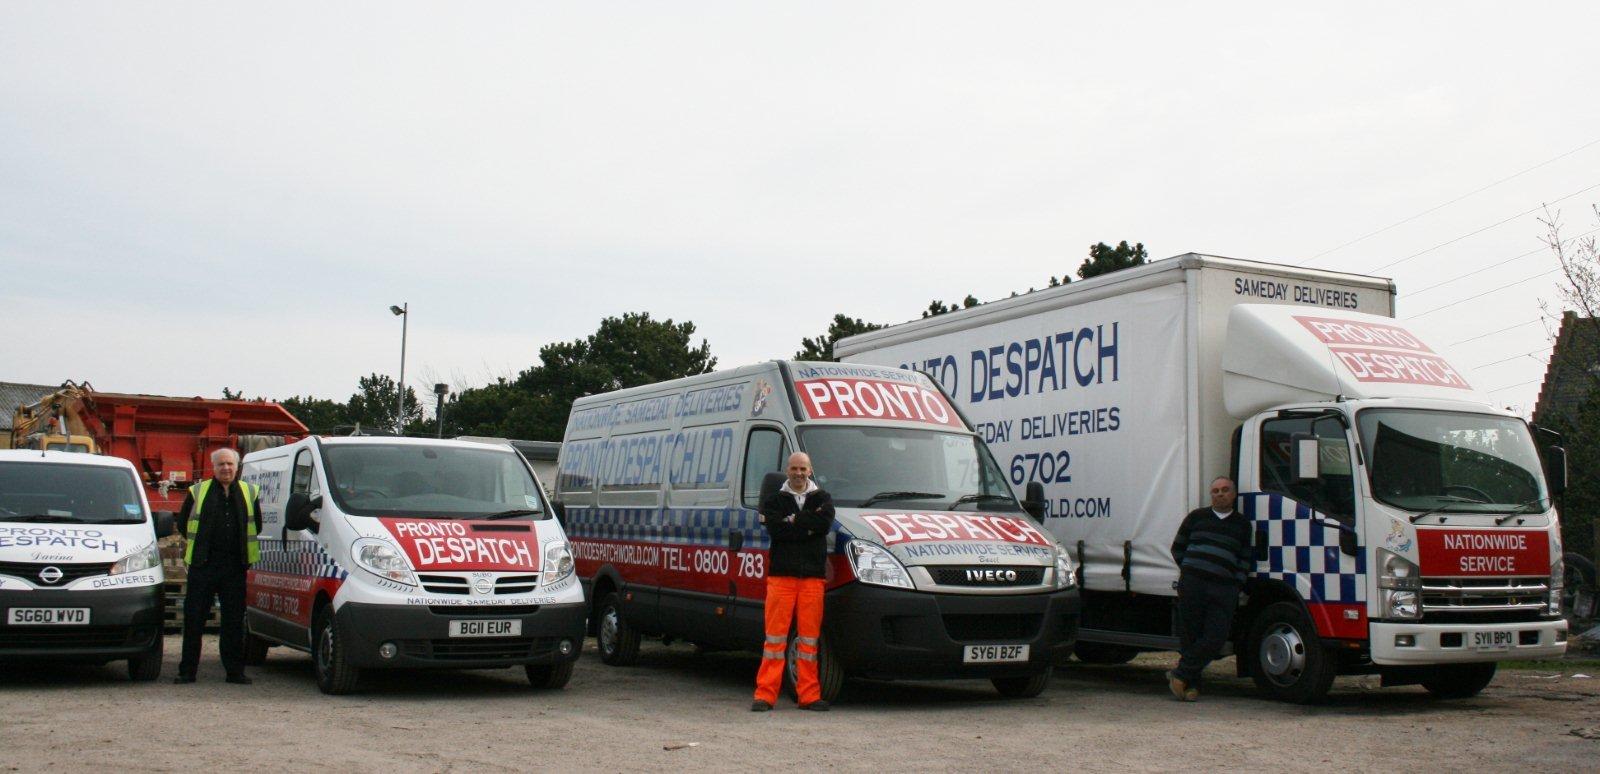 Pronto Despatch fleet (4) (002)